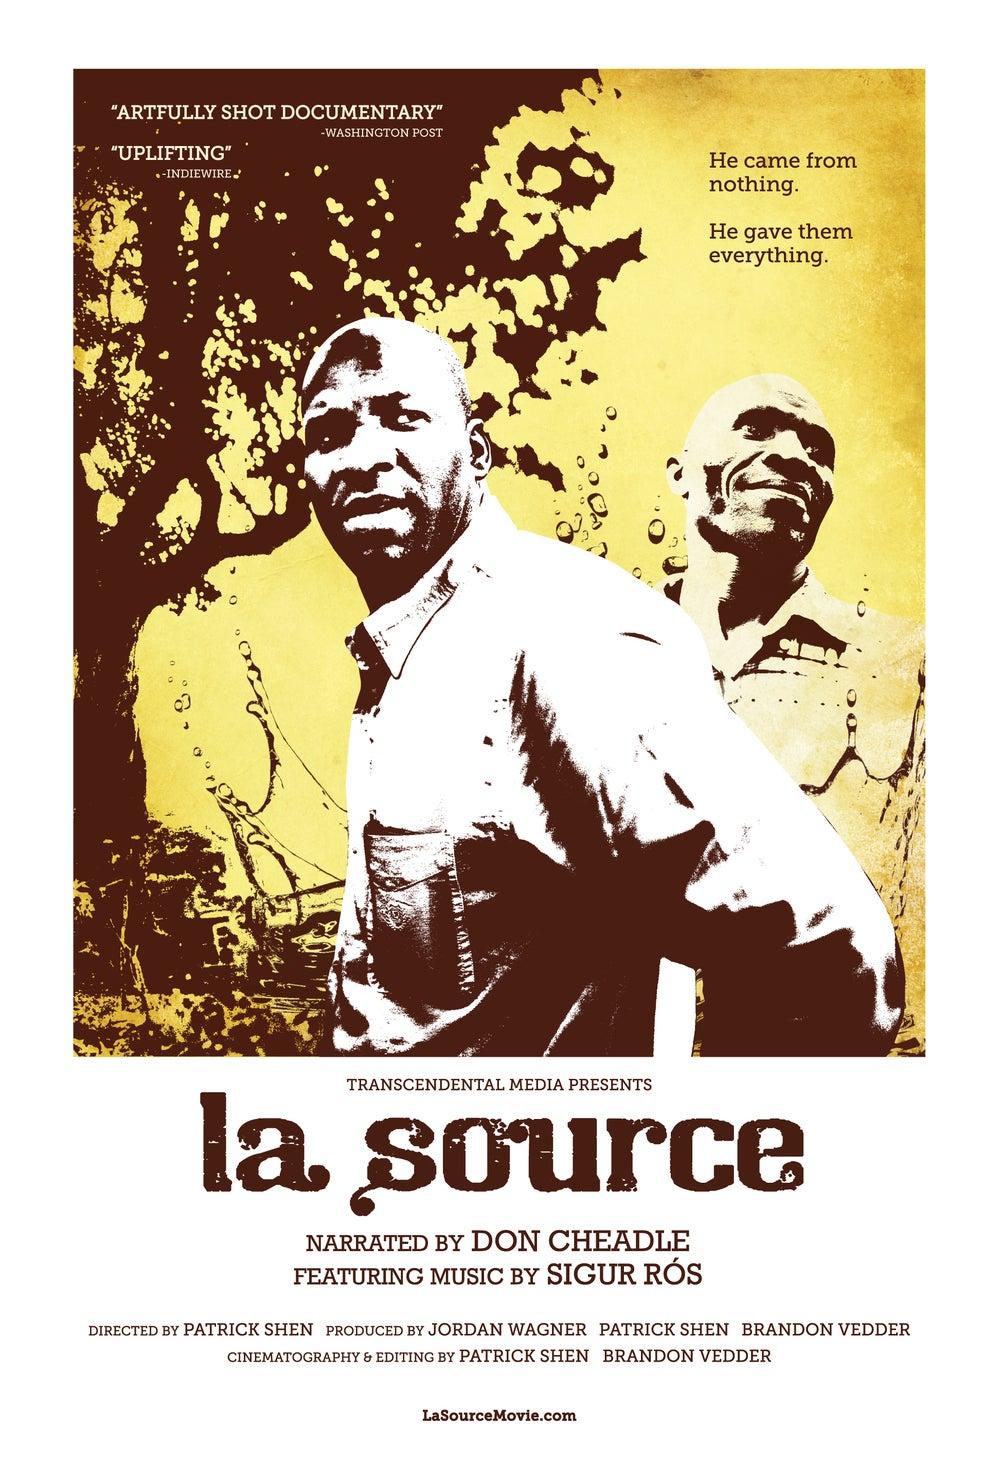 Image of La Source - 11x17 Poster